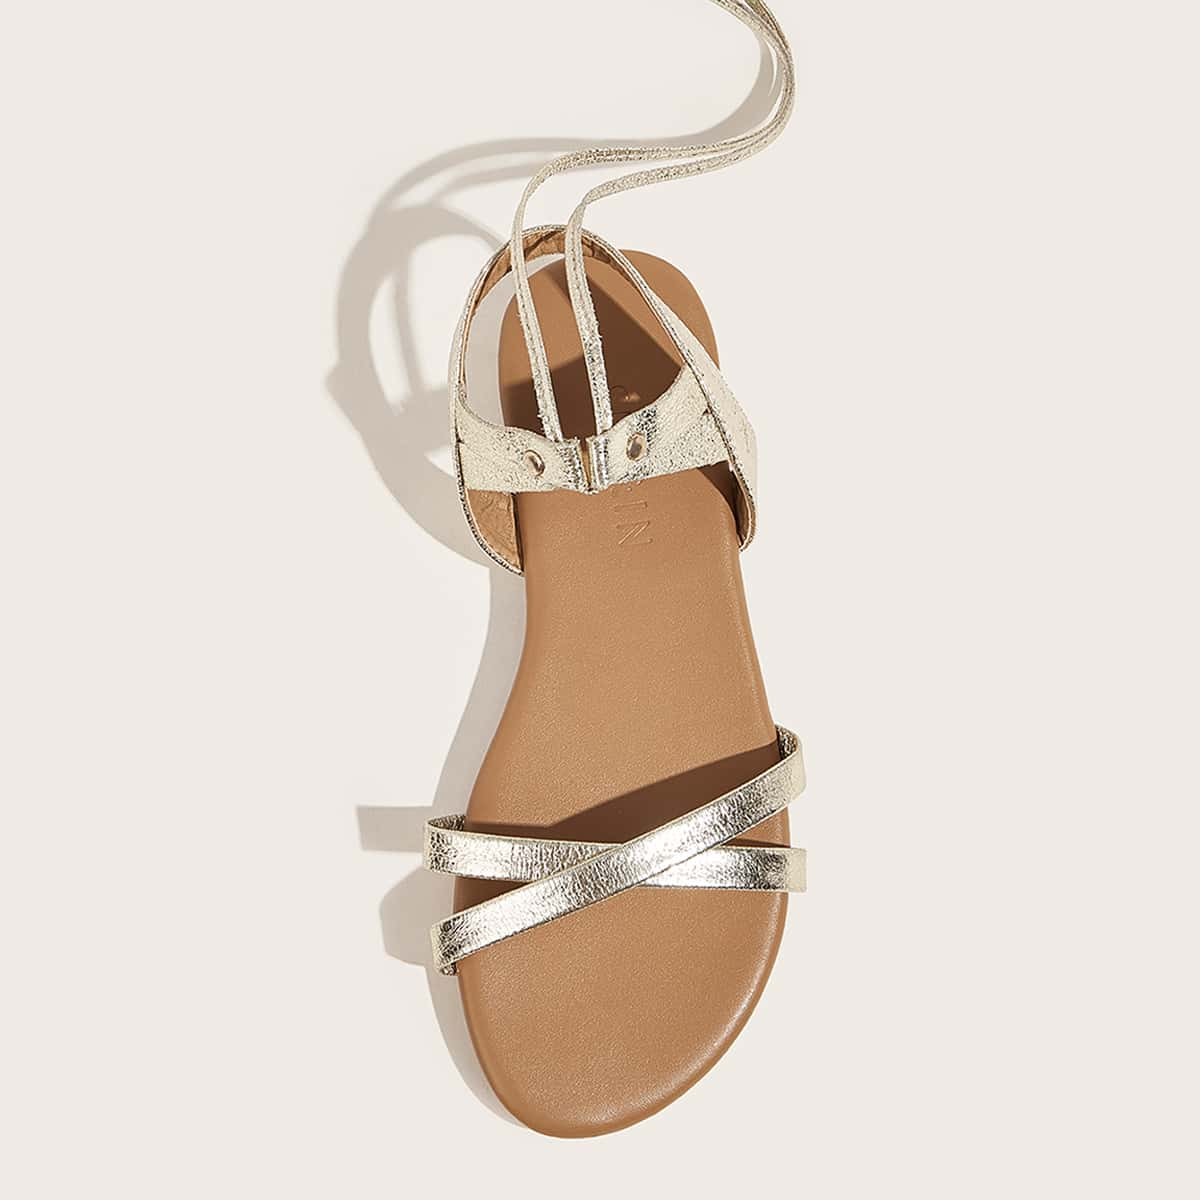 Tassel Decor Criss Cross sandalen